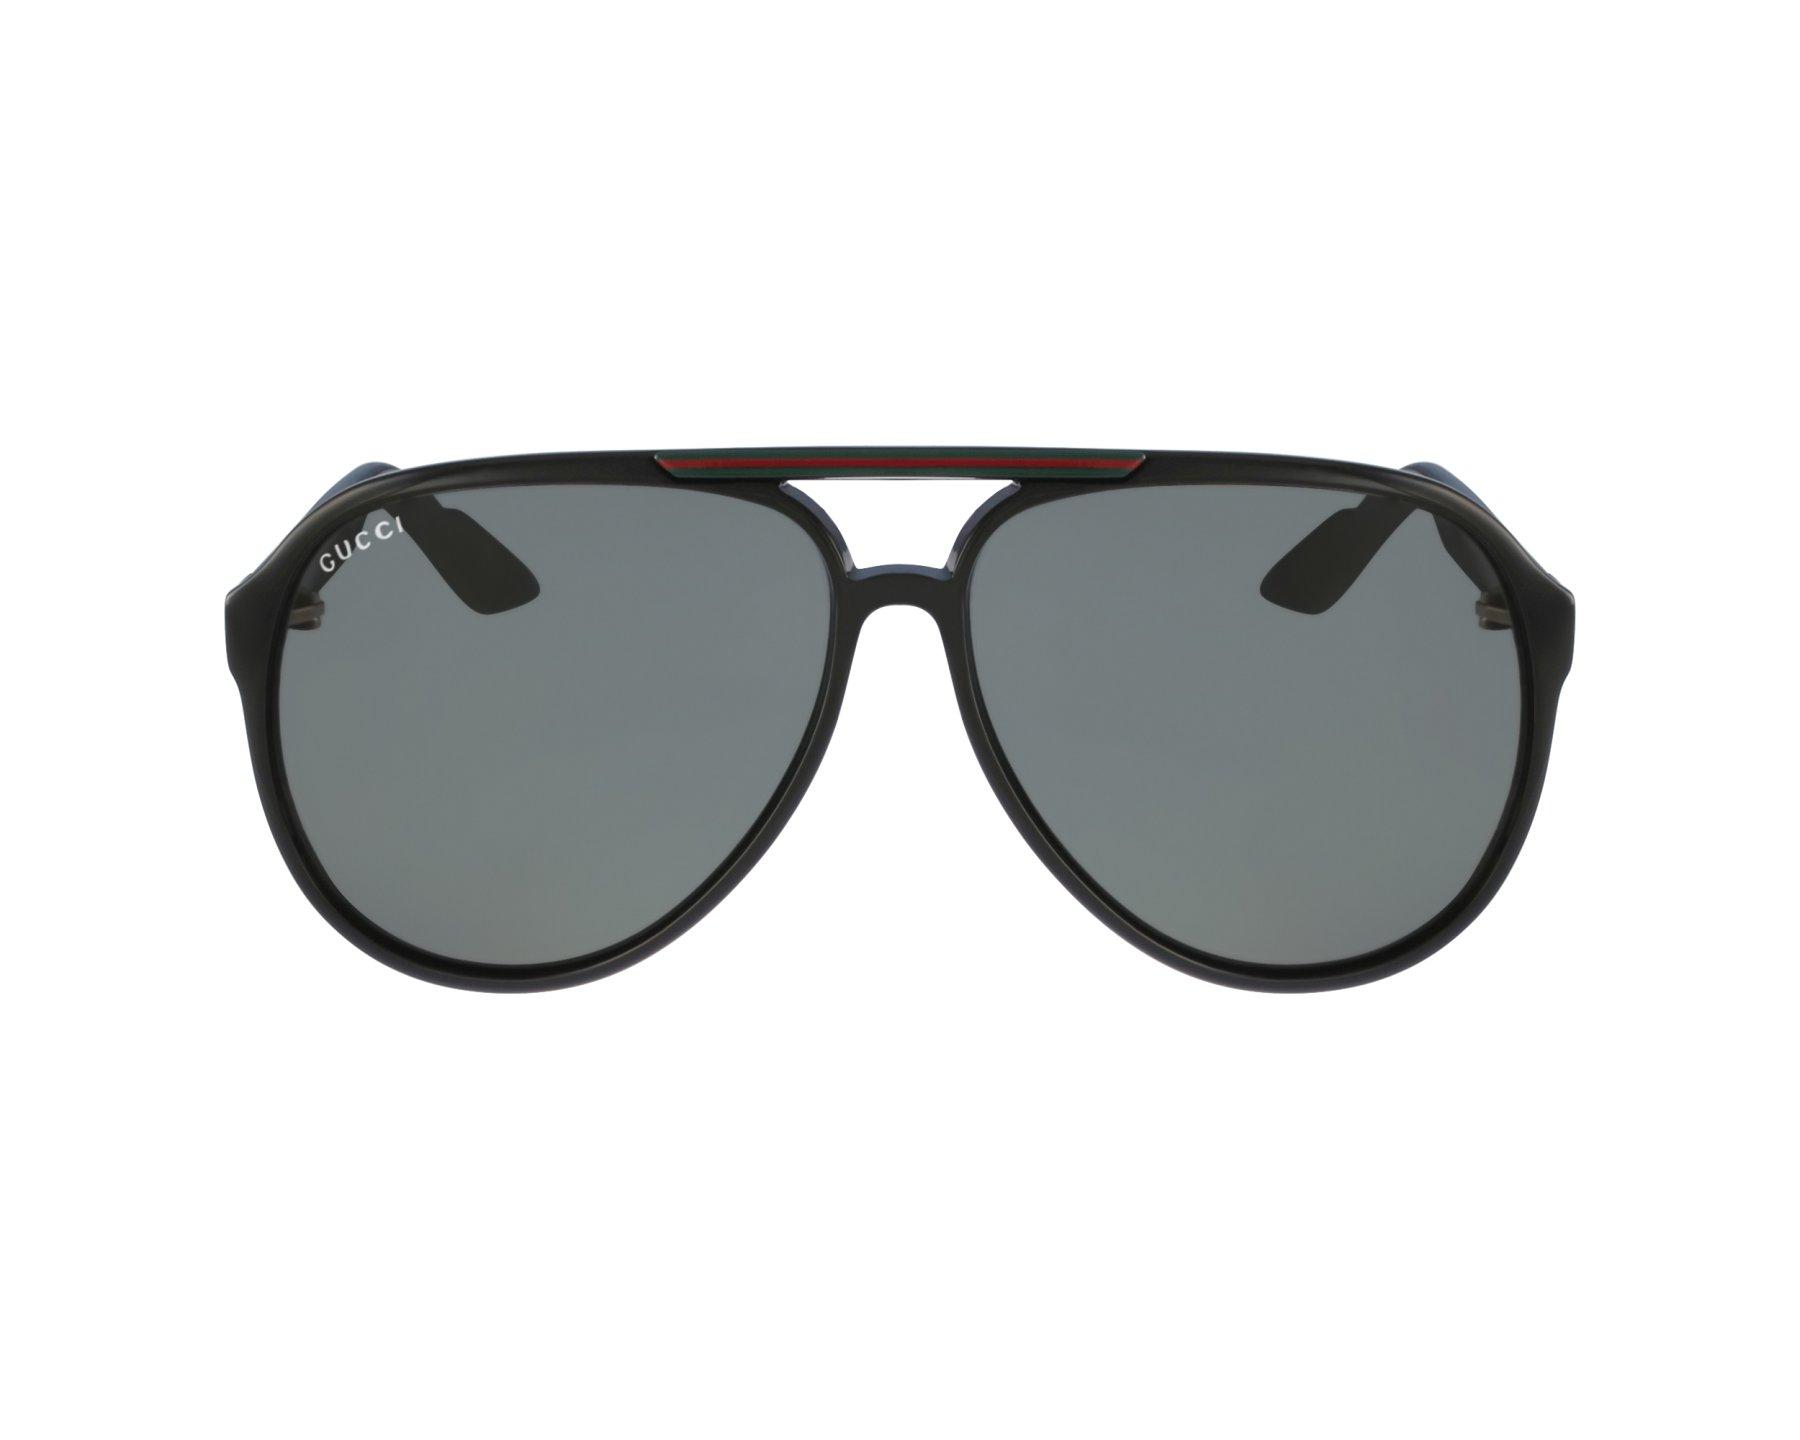 cffbf21a8bc thumbnail Sunglasses Gucci GG-1627-S D28 R6 - Black profile view